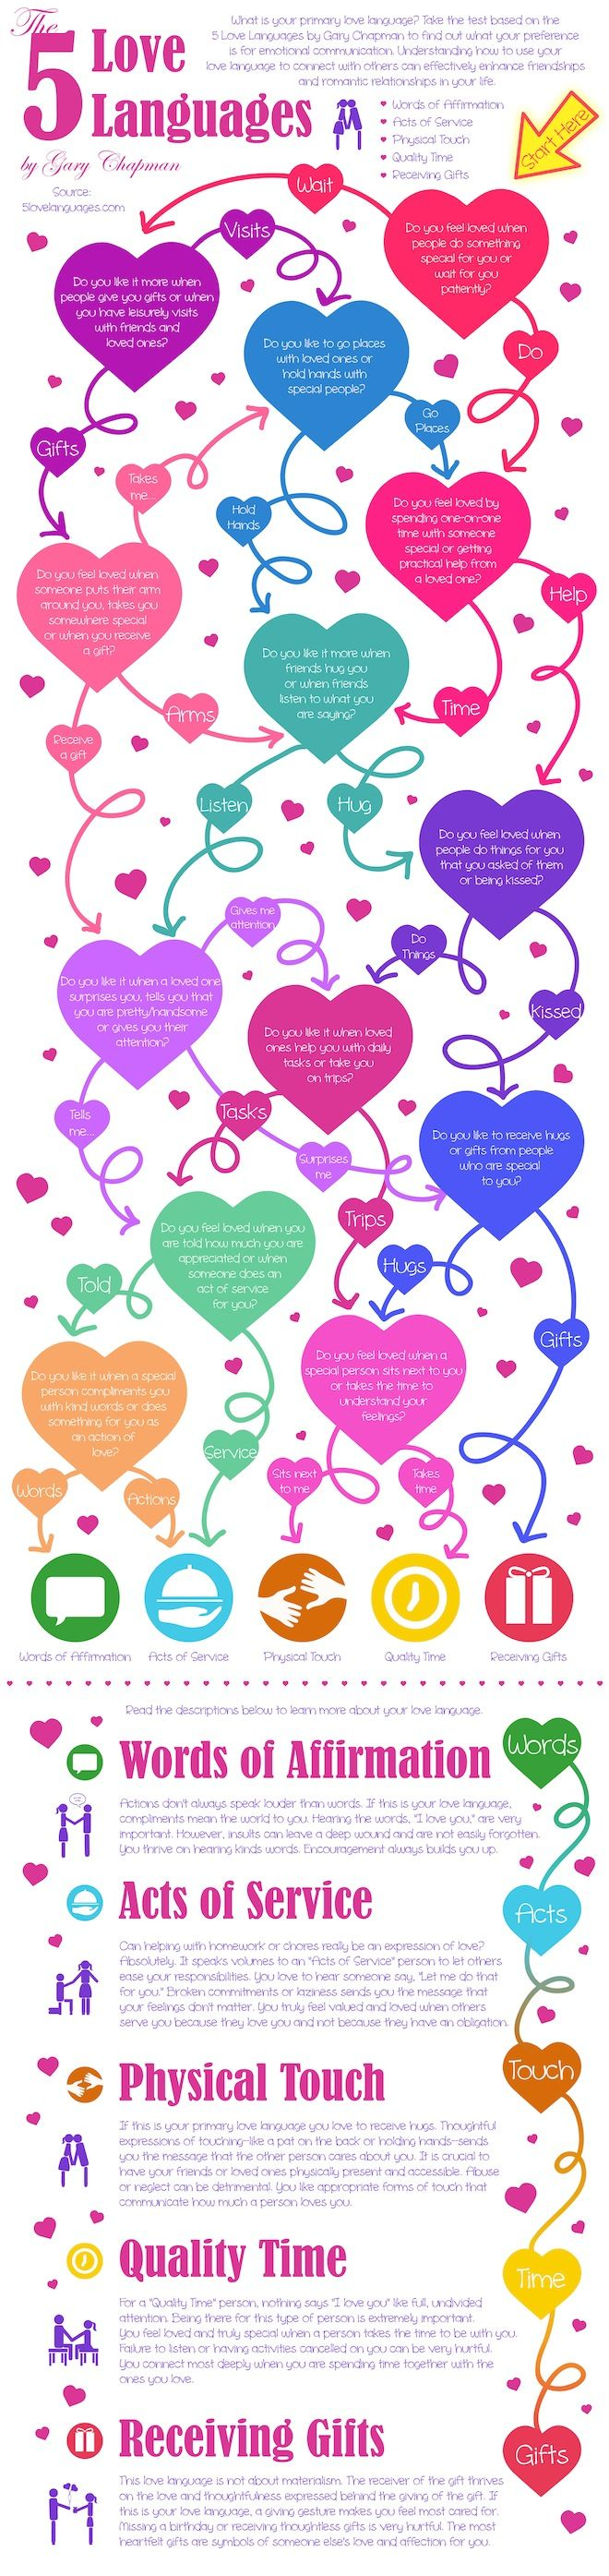 Uncategorized Kids Love Tester test your love language tommiemedia lovelanguage infographic infographic